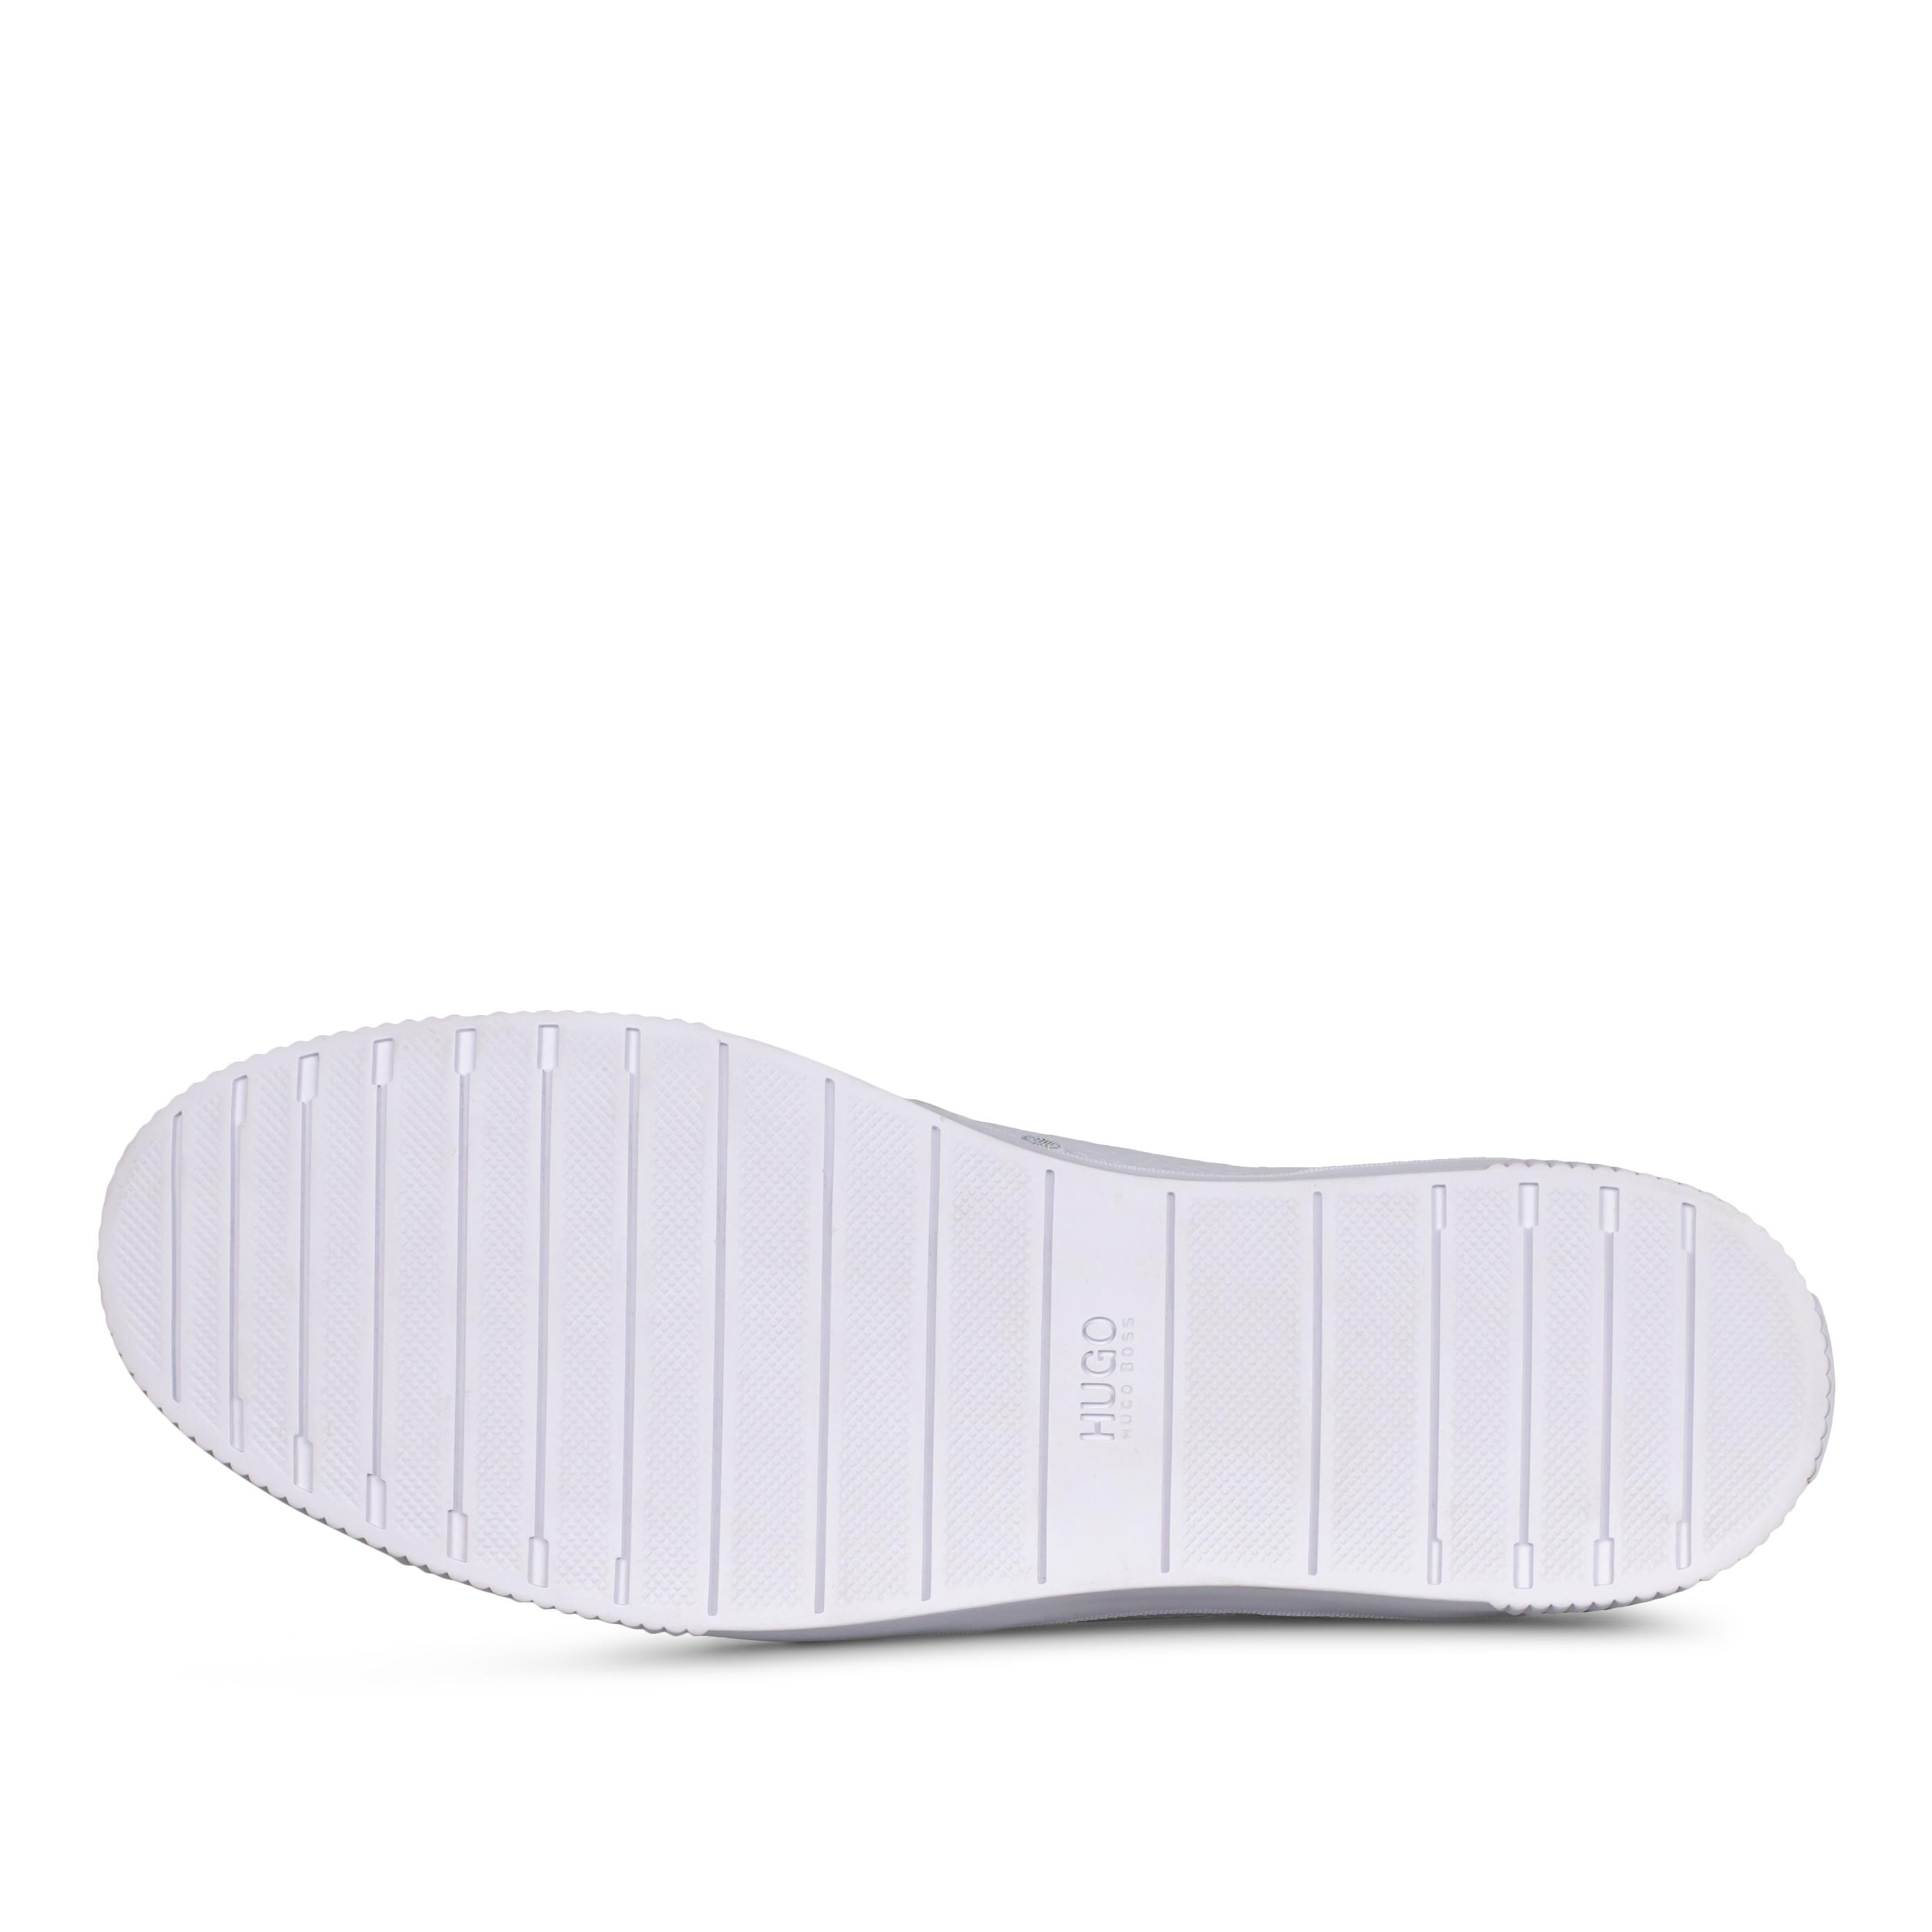 Hugo Boss Tennis-style sneakers, white, 41